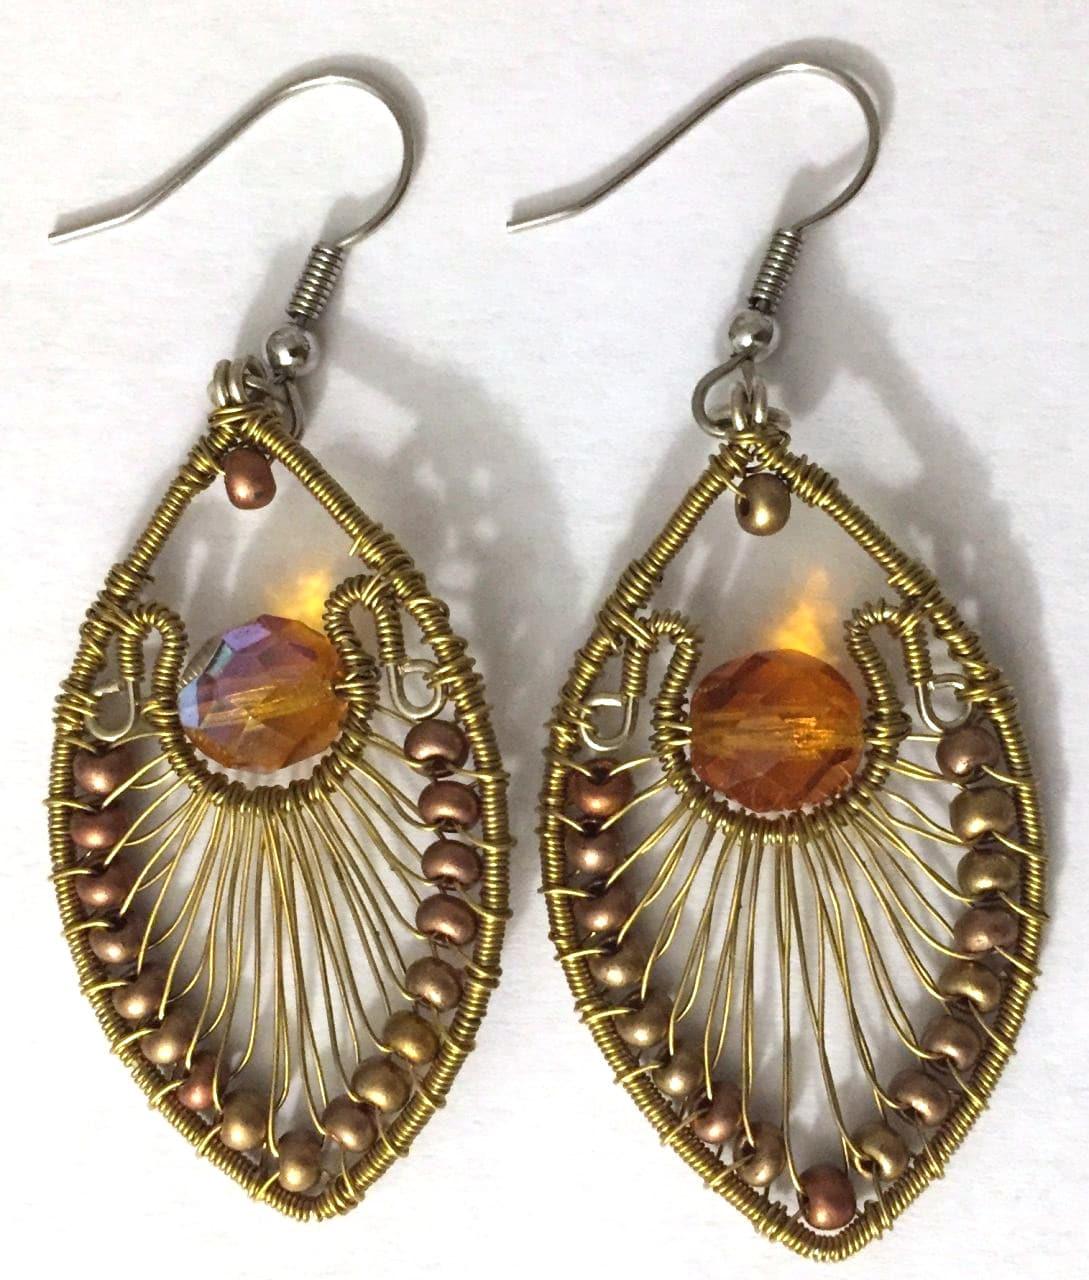 Peacock Earrings - Gold